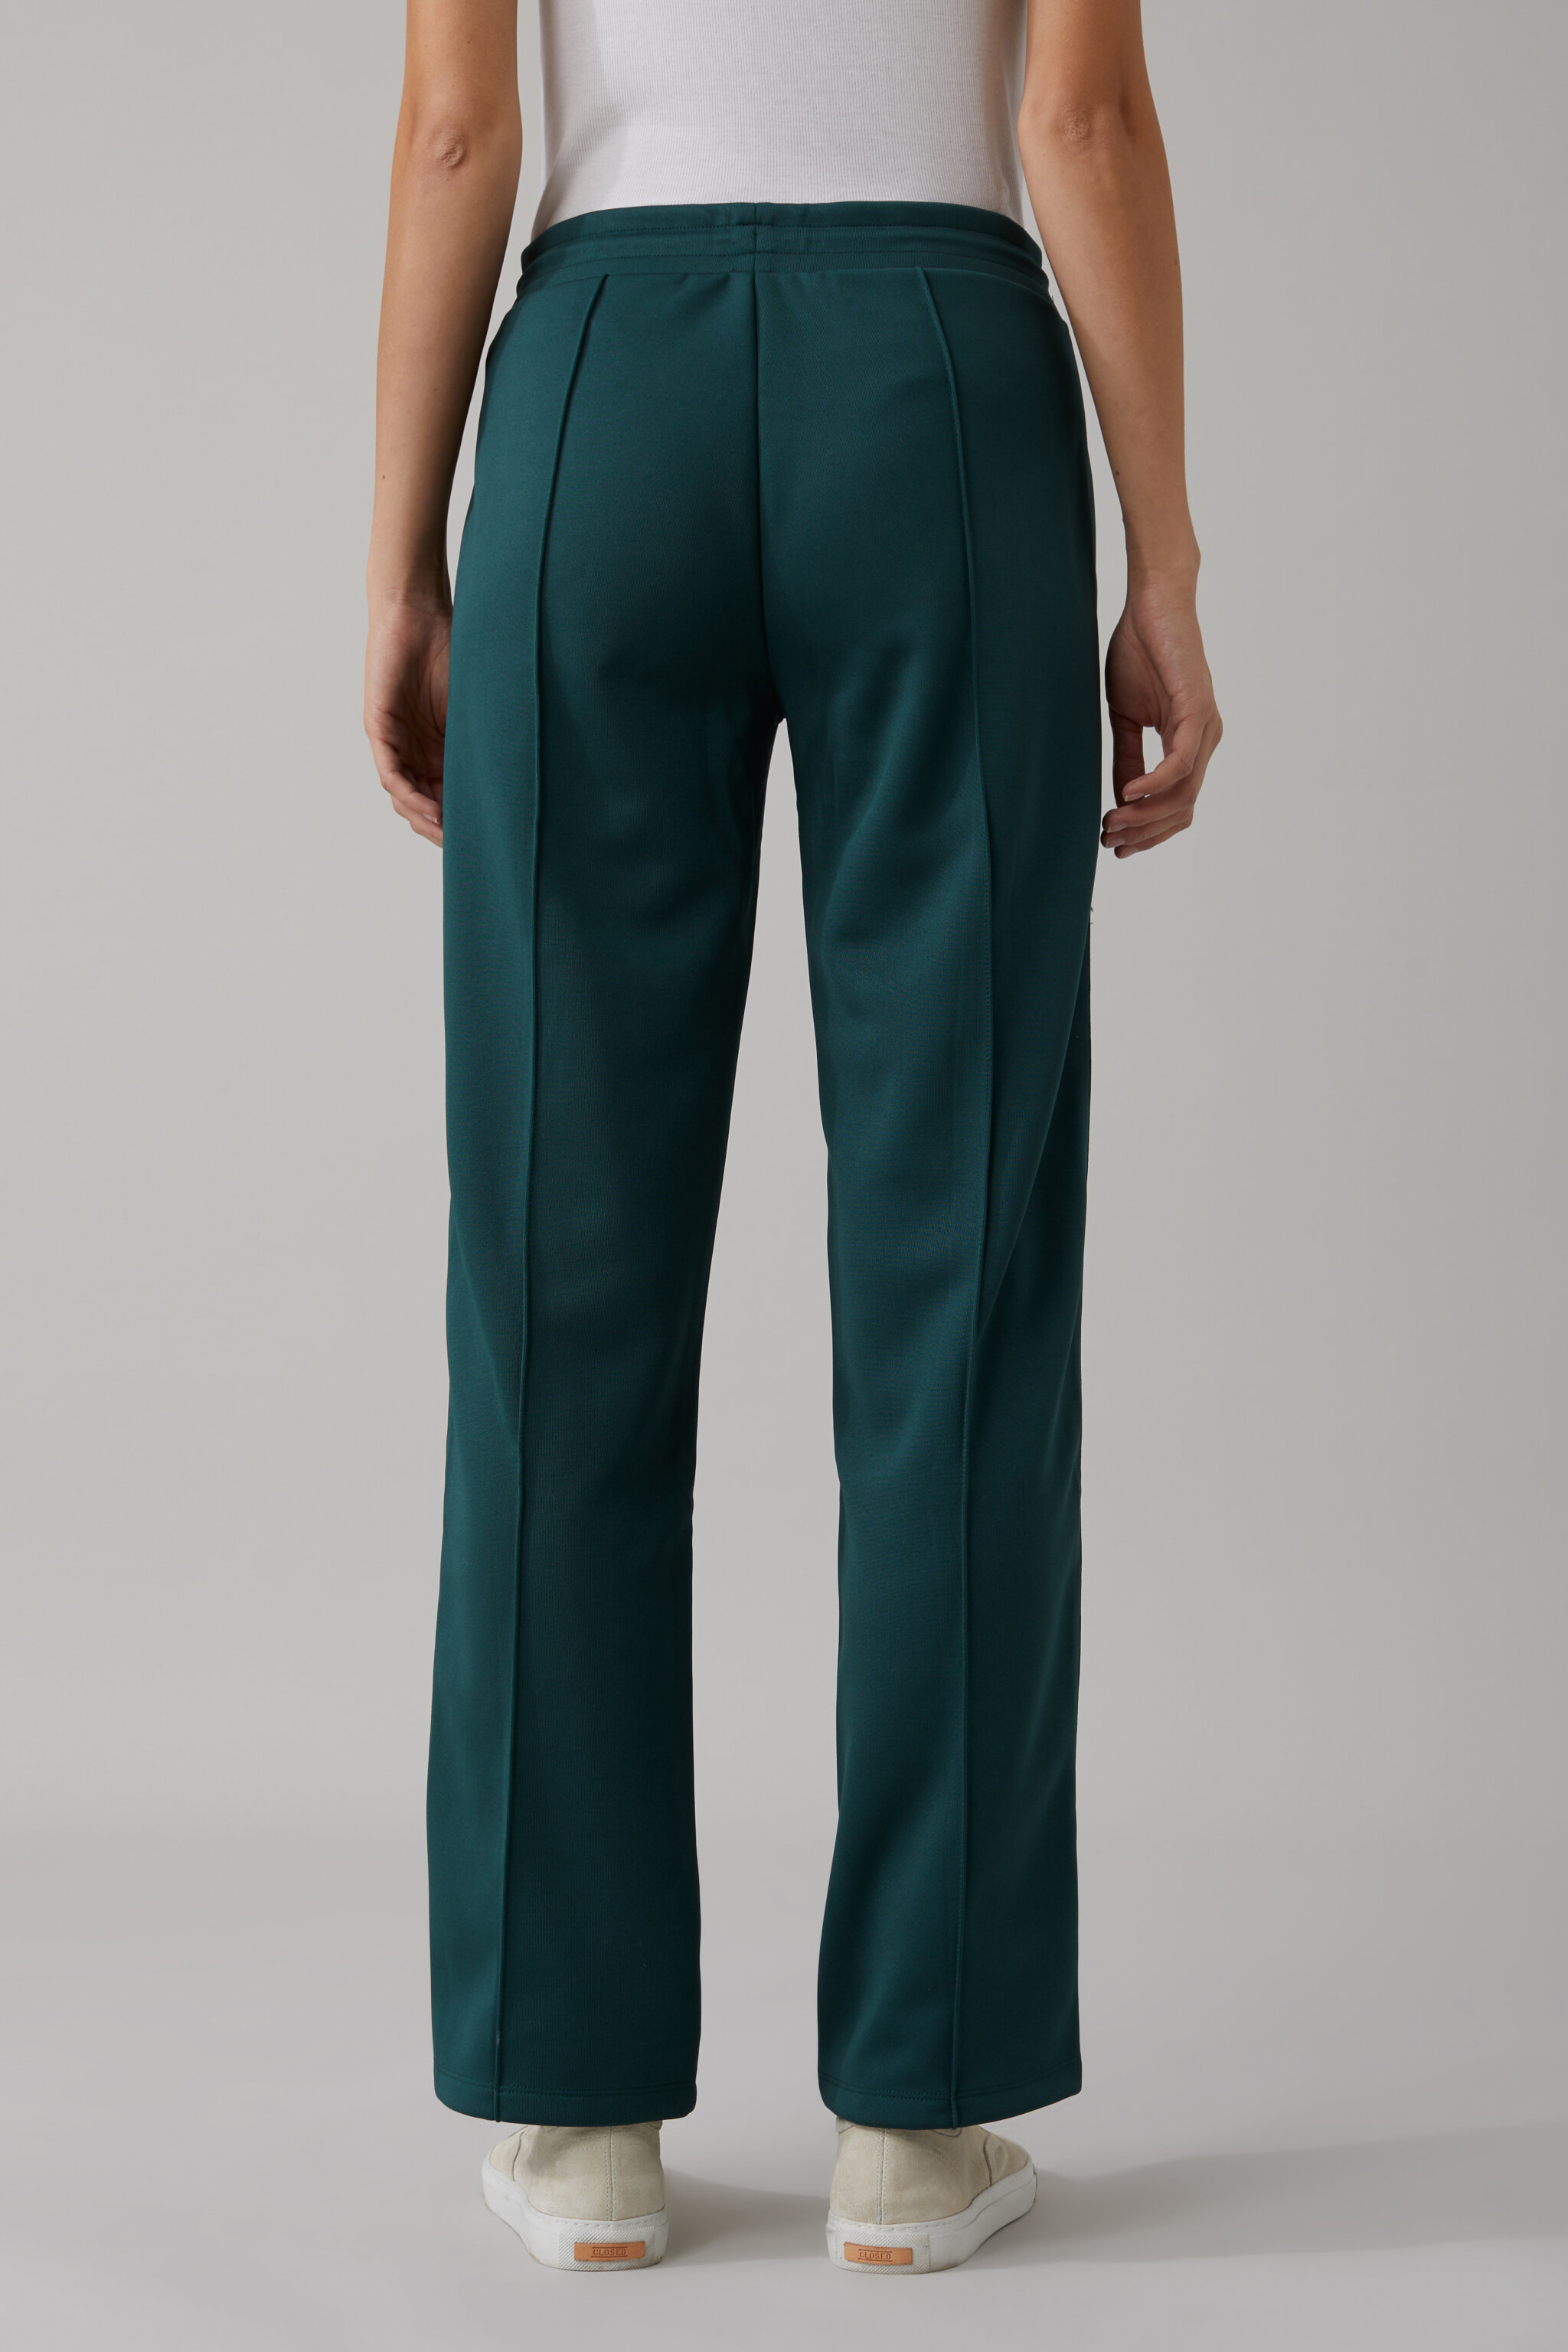 - Damen CLOSED Trackpants evergreen | 4054736692745